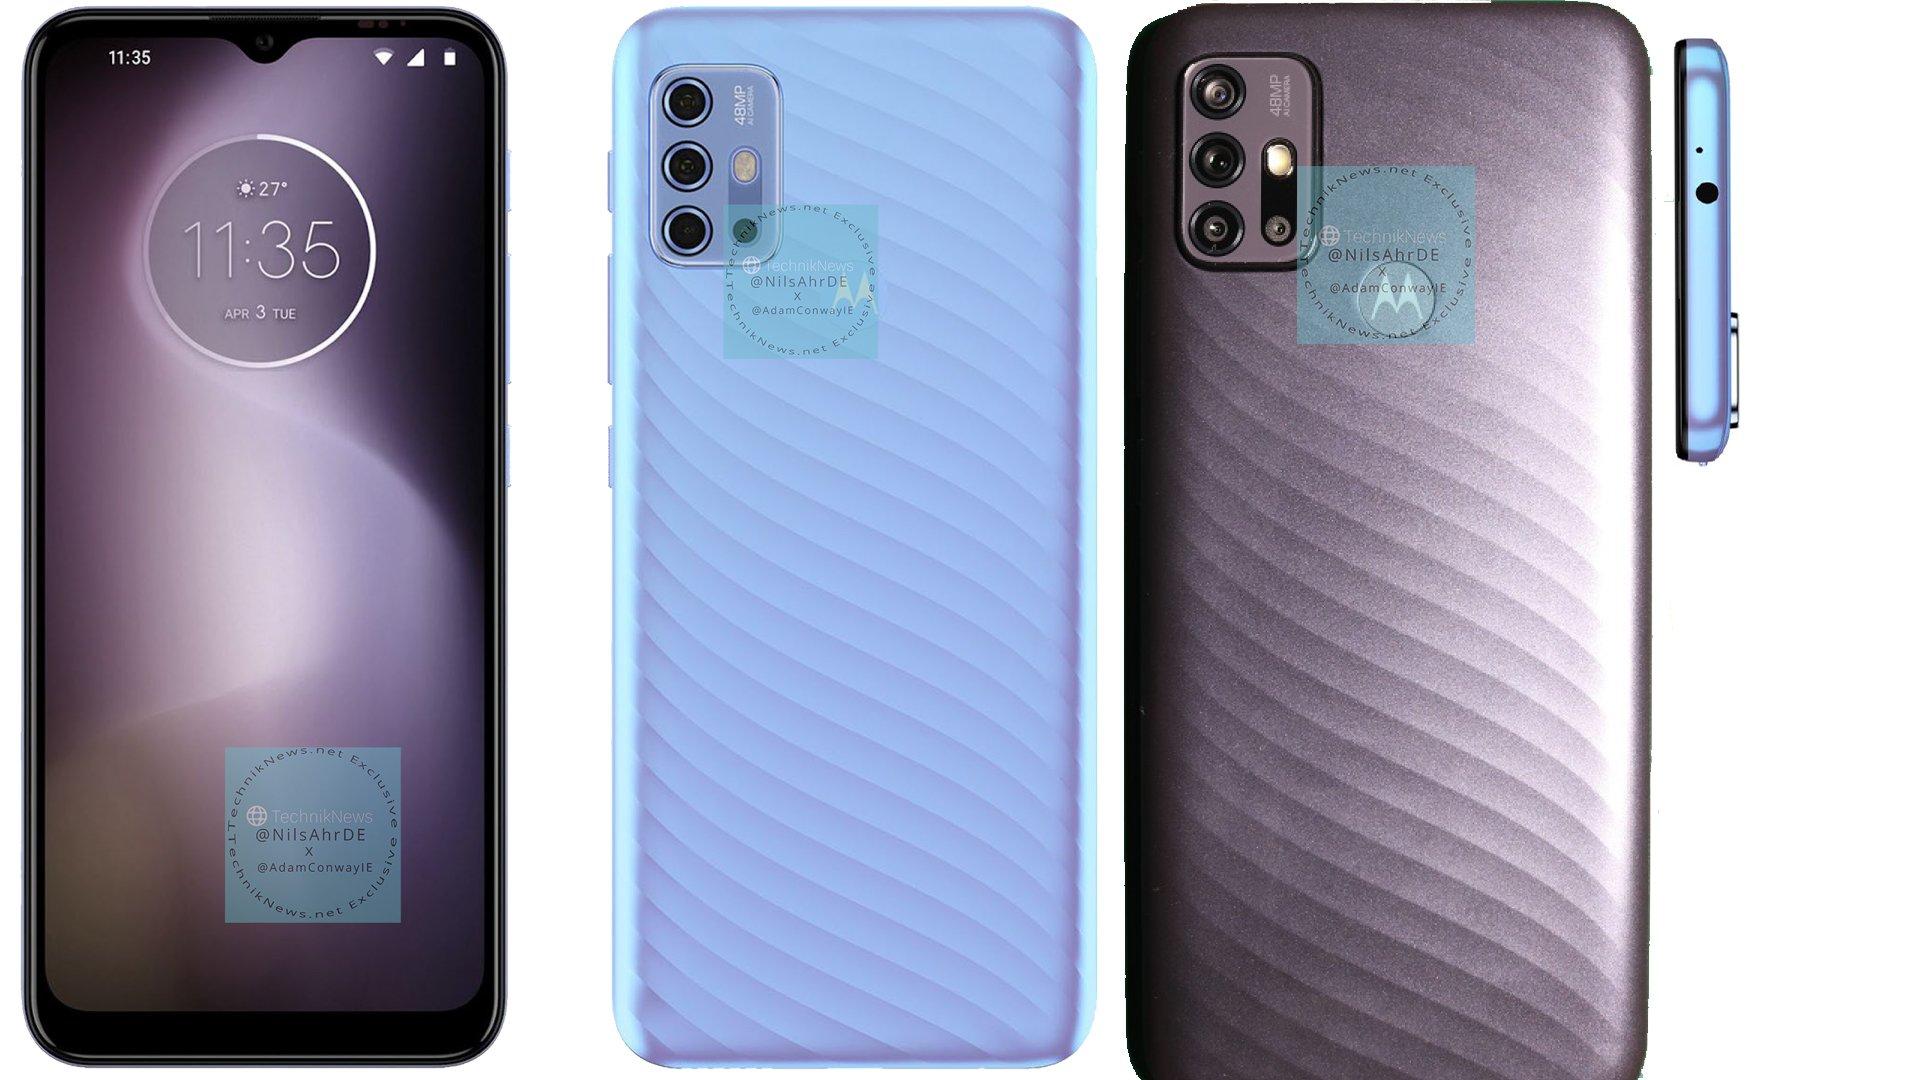 Motorola G10, G30, G40, E7 Power key specifications, renders leaked